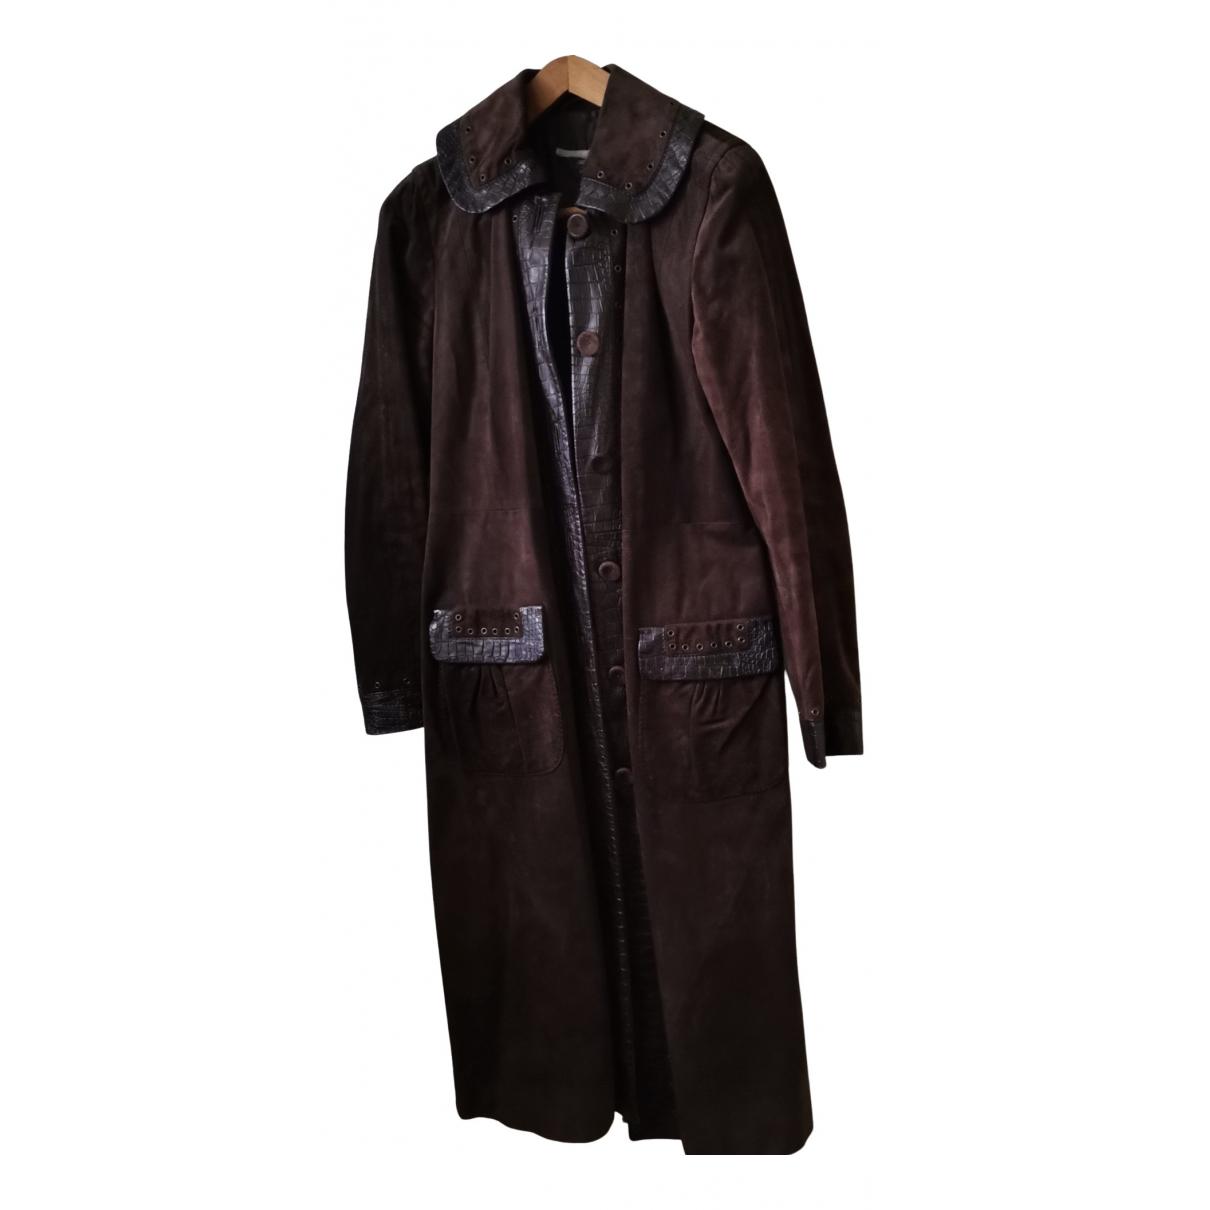 Max Mara - Manteau   pour femme en cuir - marron